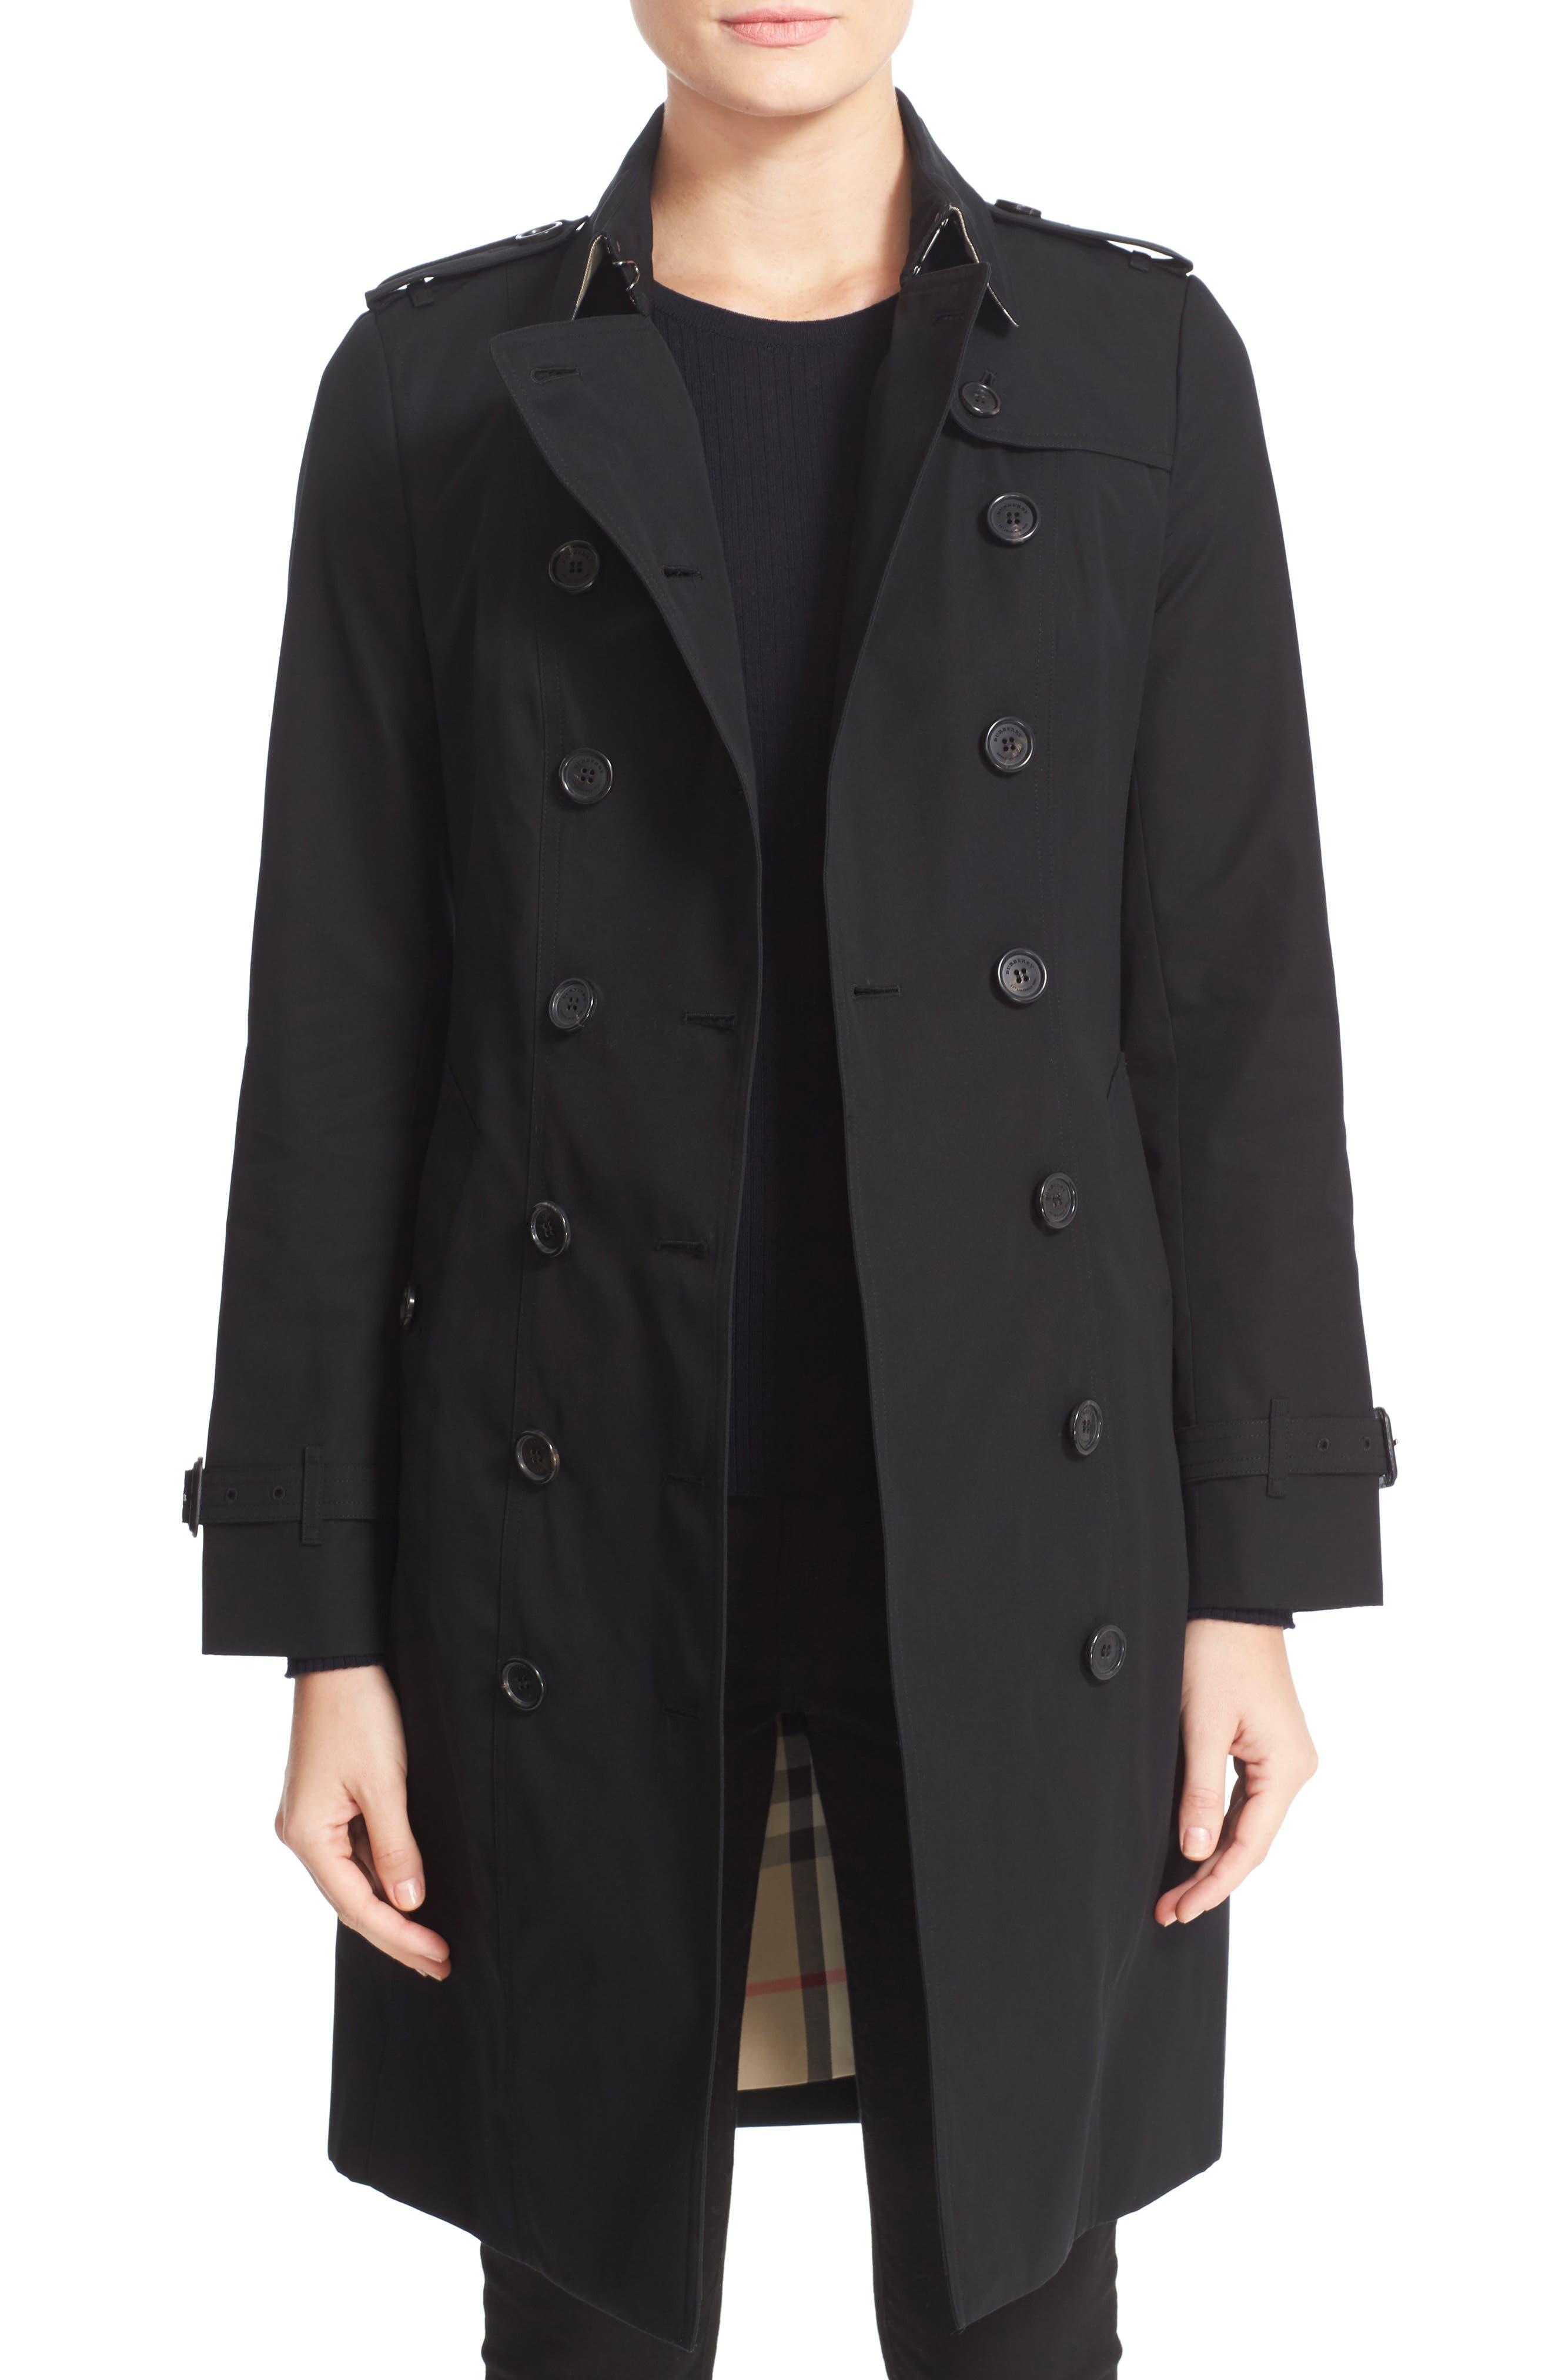 BURBERRY, Sandringham Long Slim Trench Coat, Main thumbnail 1, color, BLACK